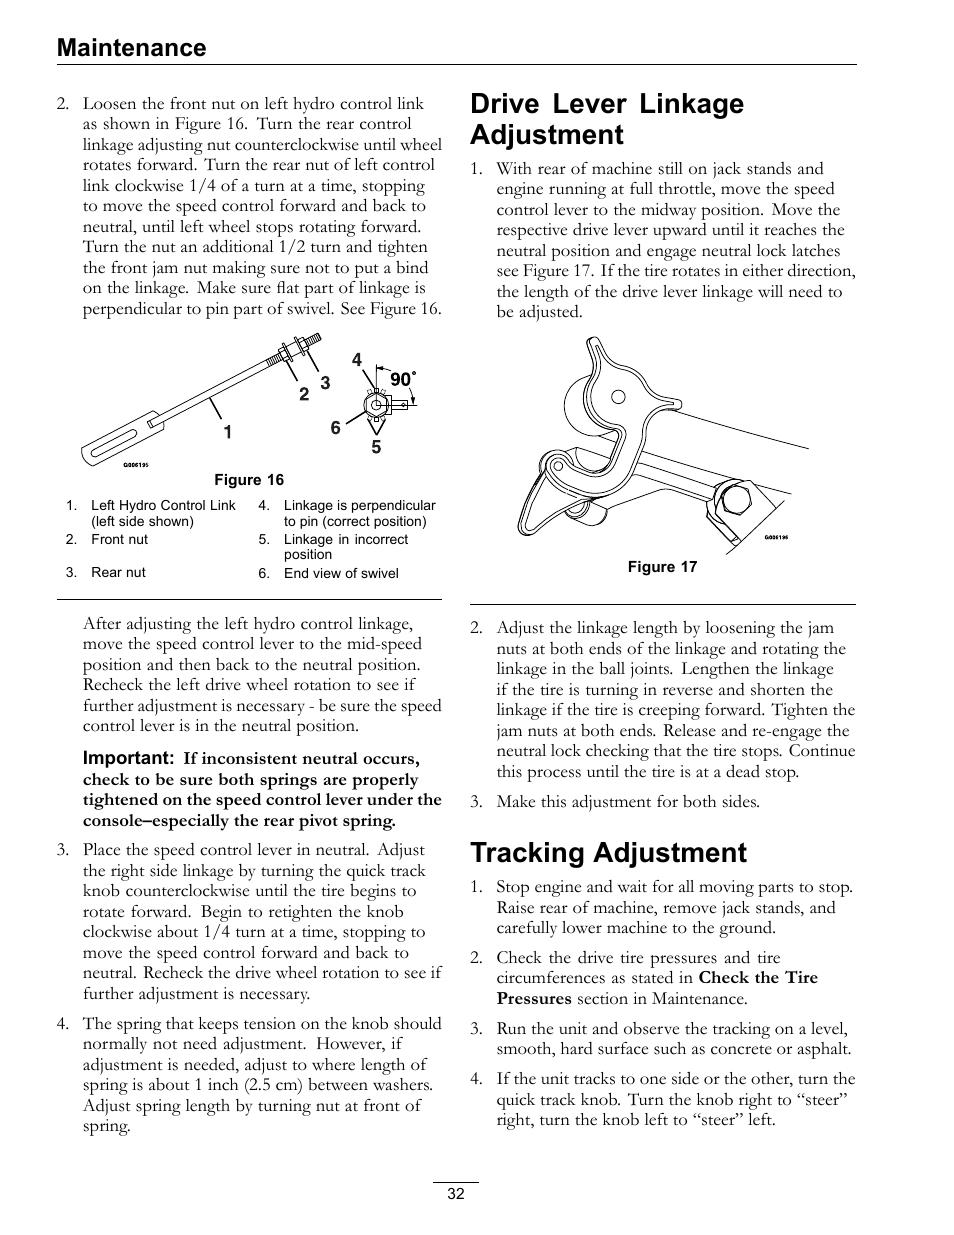 Drive lever linkage adjustment tracking adjustment, Drive